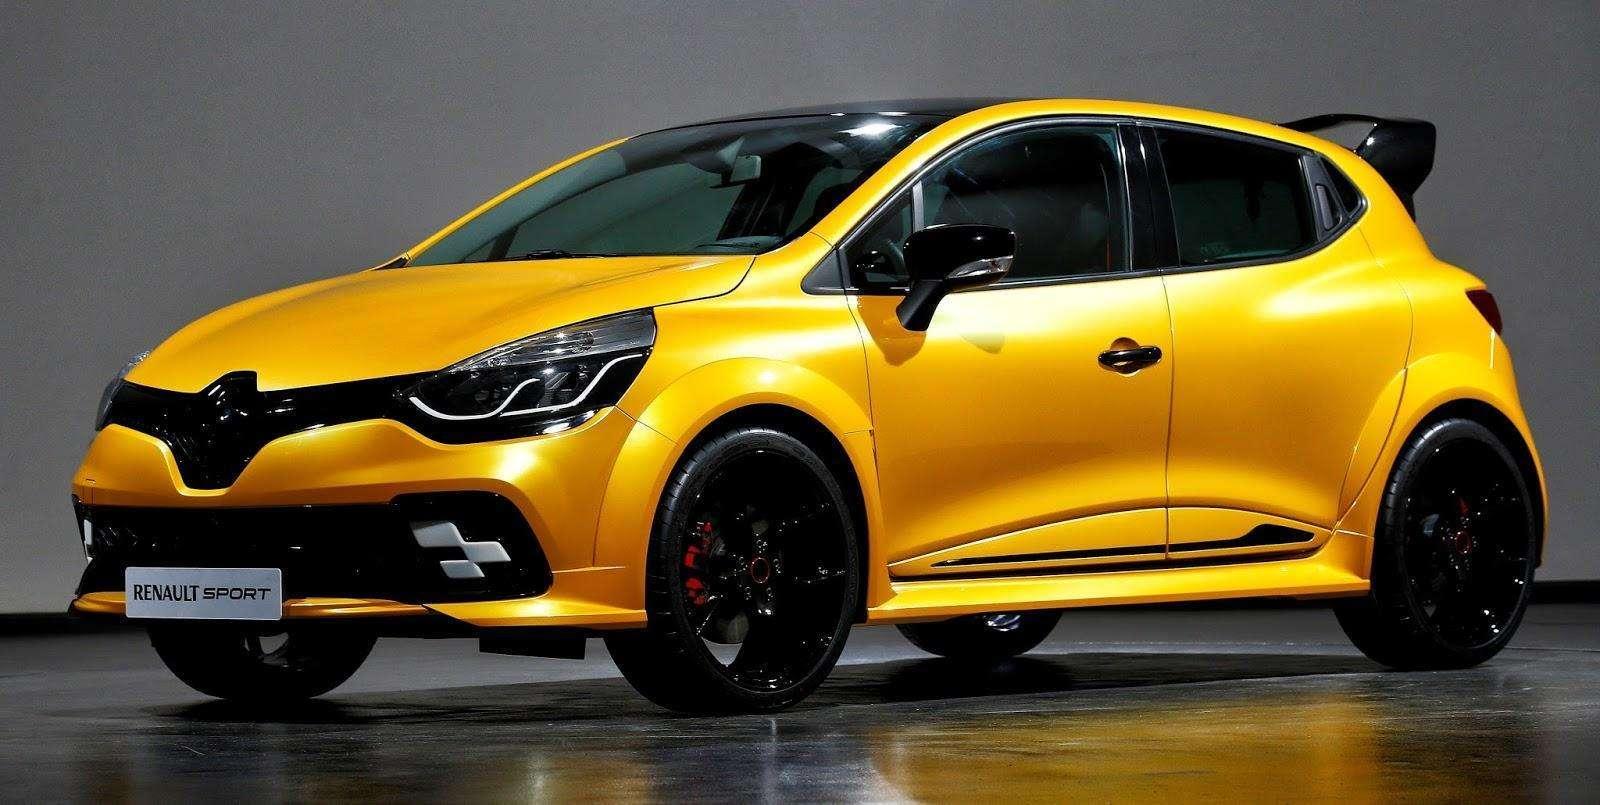 Renault apresenta Clio RS 16: compacto com 275 cavalos!